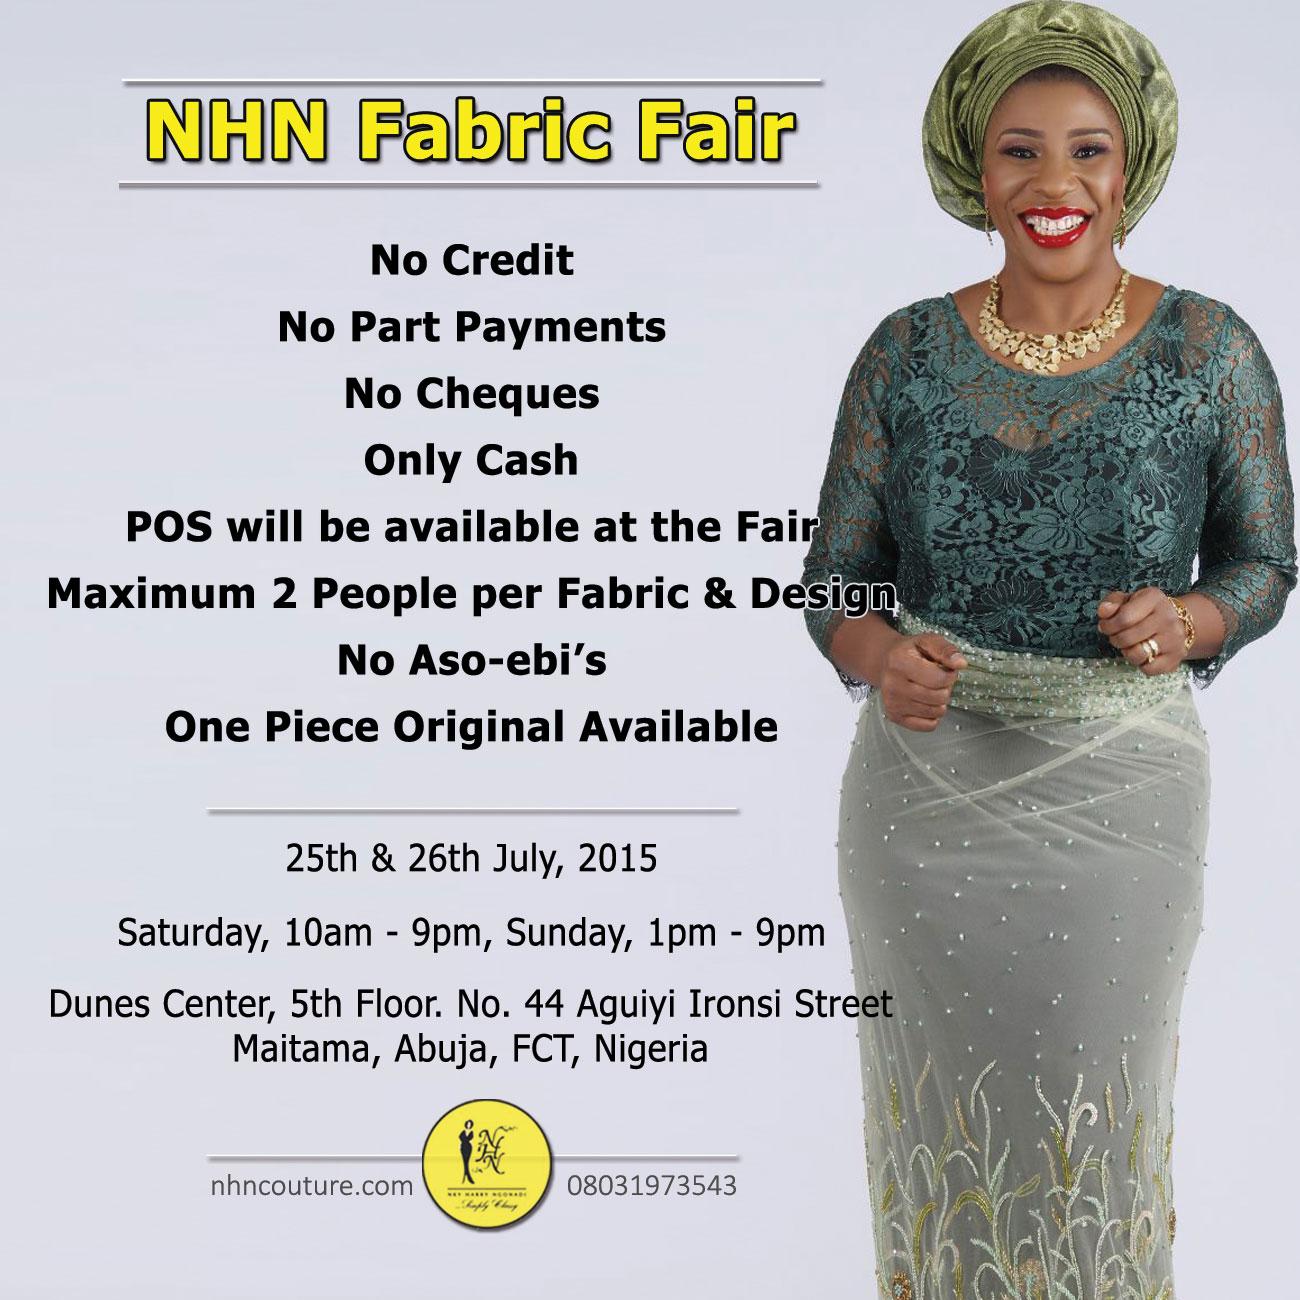 NHN-Abuja_Fabric-Fair_Terms-&-Conditions